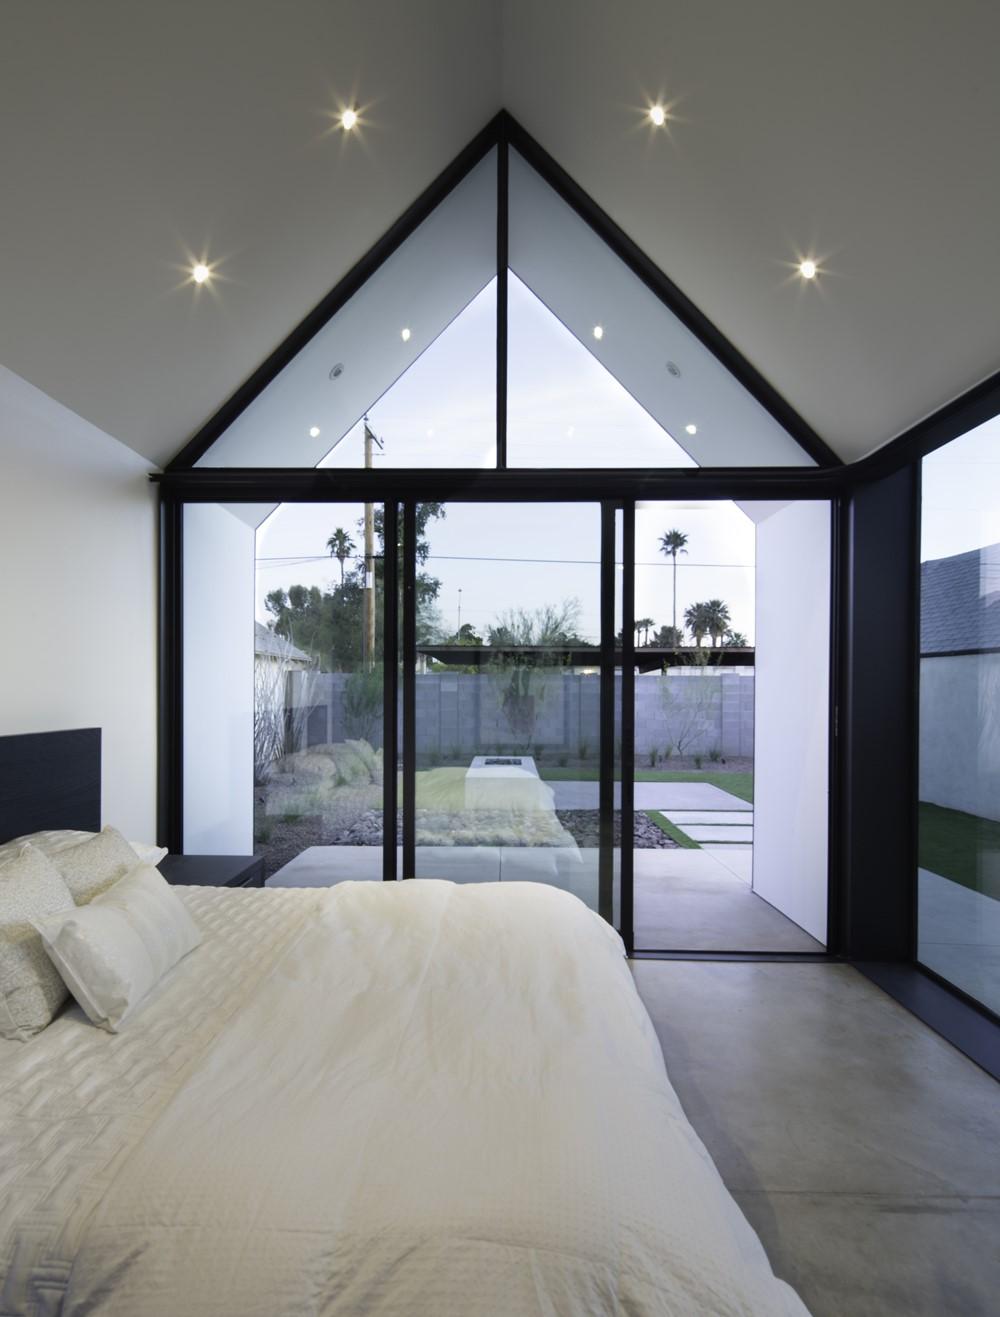 escobar renovation by chen suchart studio myhouseidea. Black Bedroom Furniture Sets. Home Design Ideas